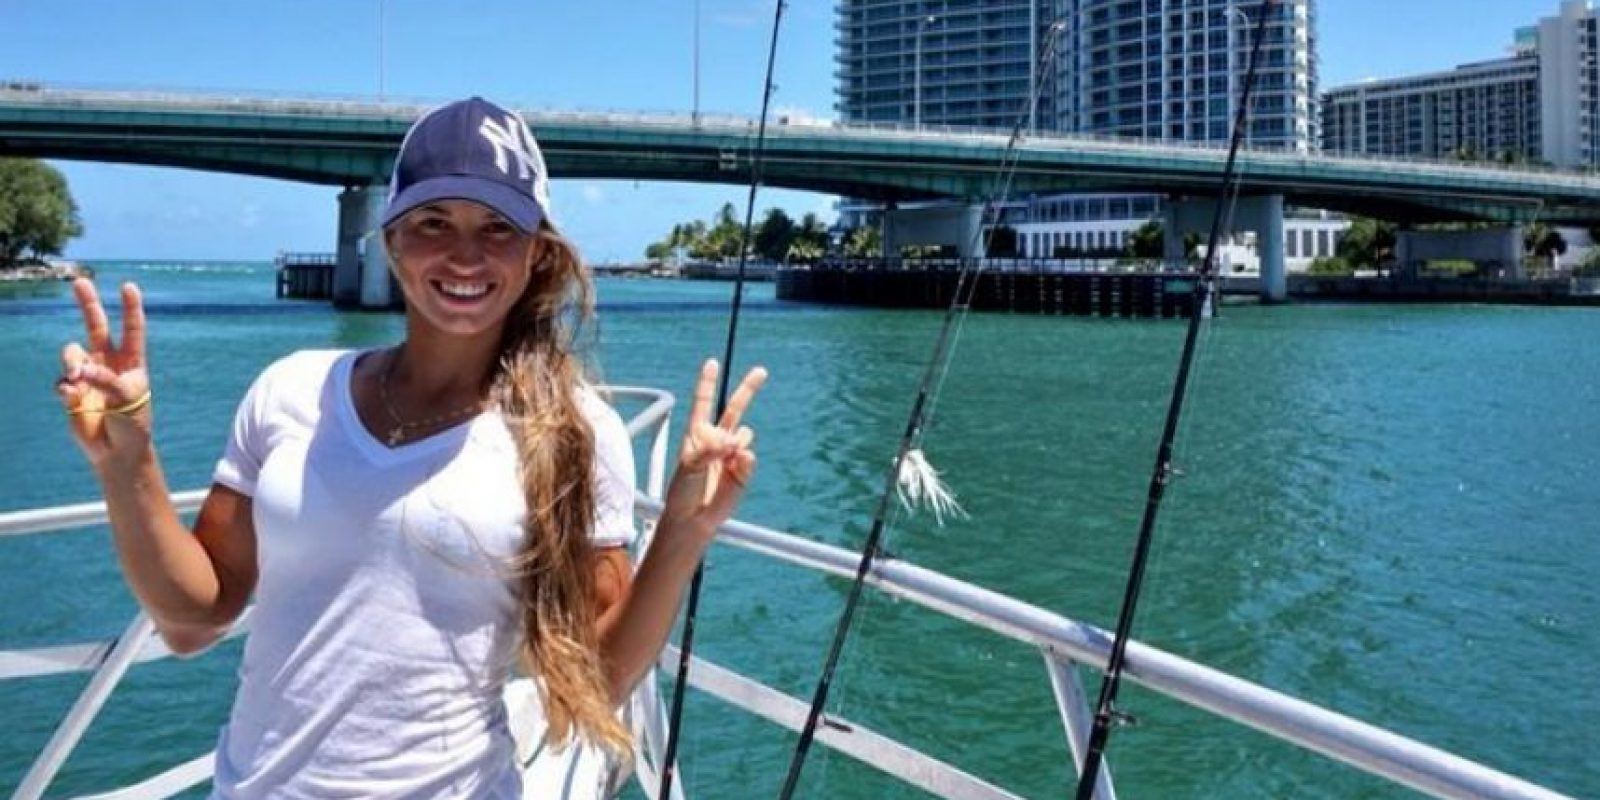 Ocupa el sitio 114 del ranking de la WTA Foto:Twitter: @Yulka1995P